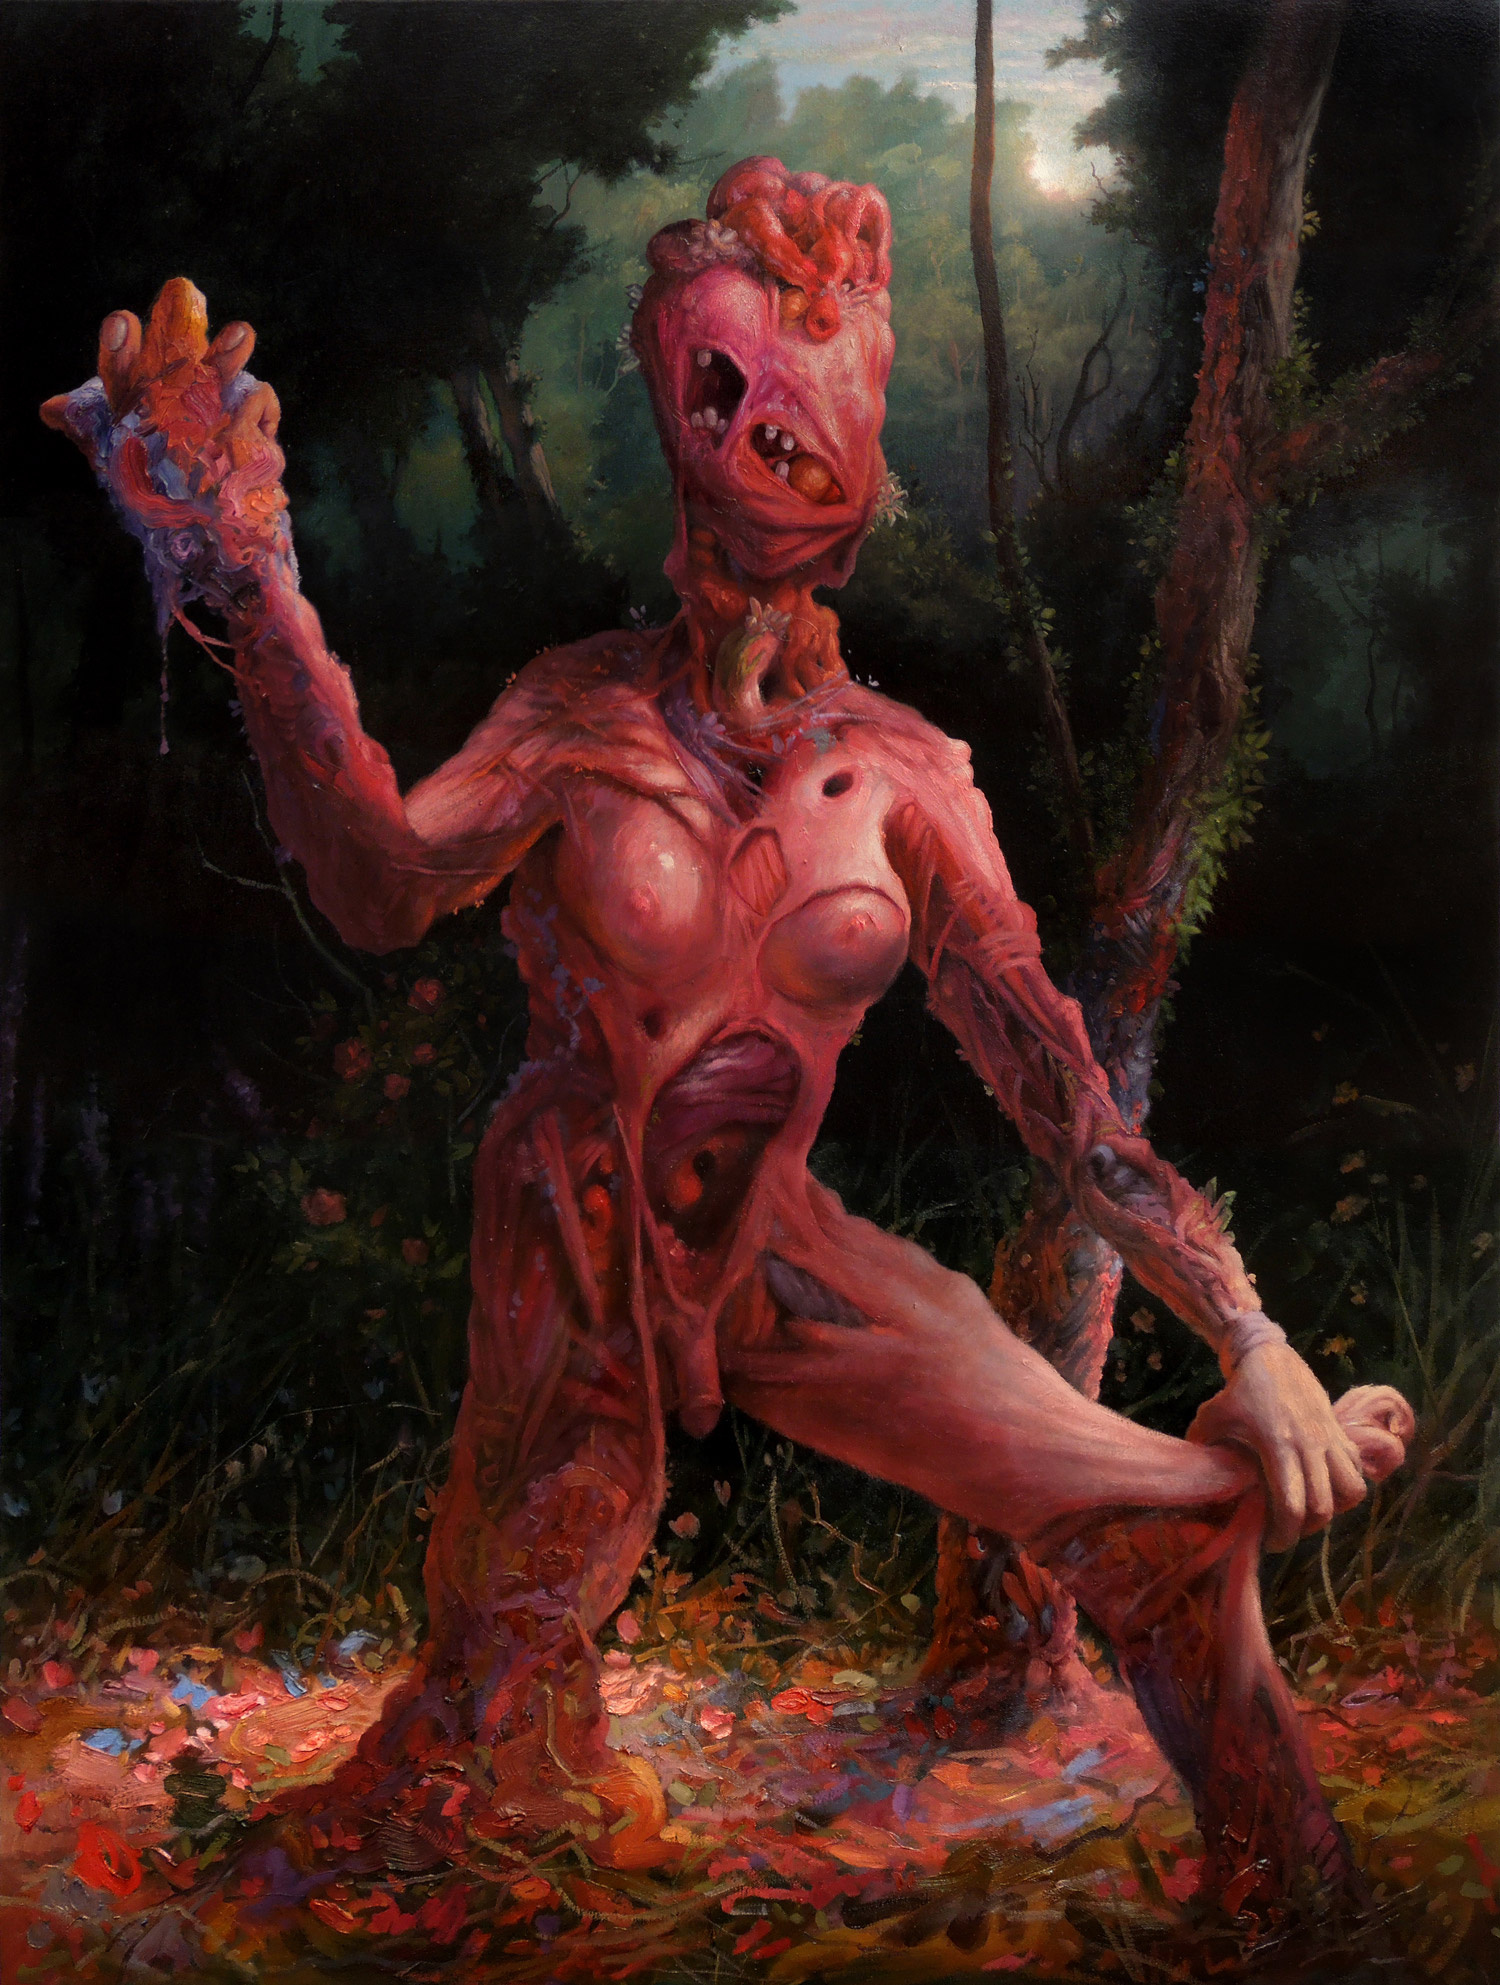 Adrian Cox, painting - New Skin